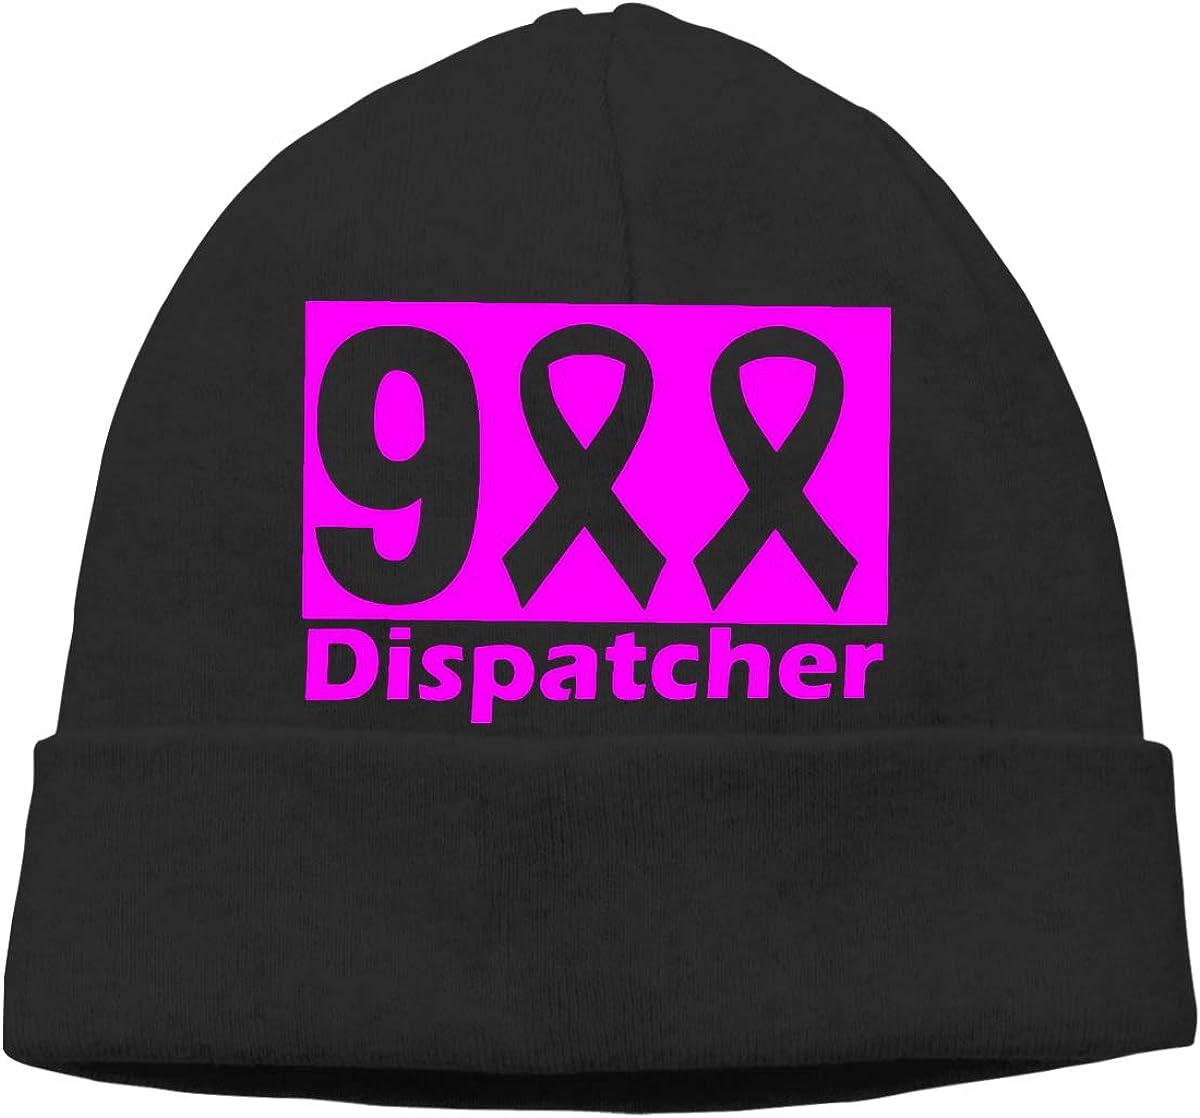 GDSG5/&4 911 Dispatcher Unisex Daily Slouchy Cycling Beanie Cap